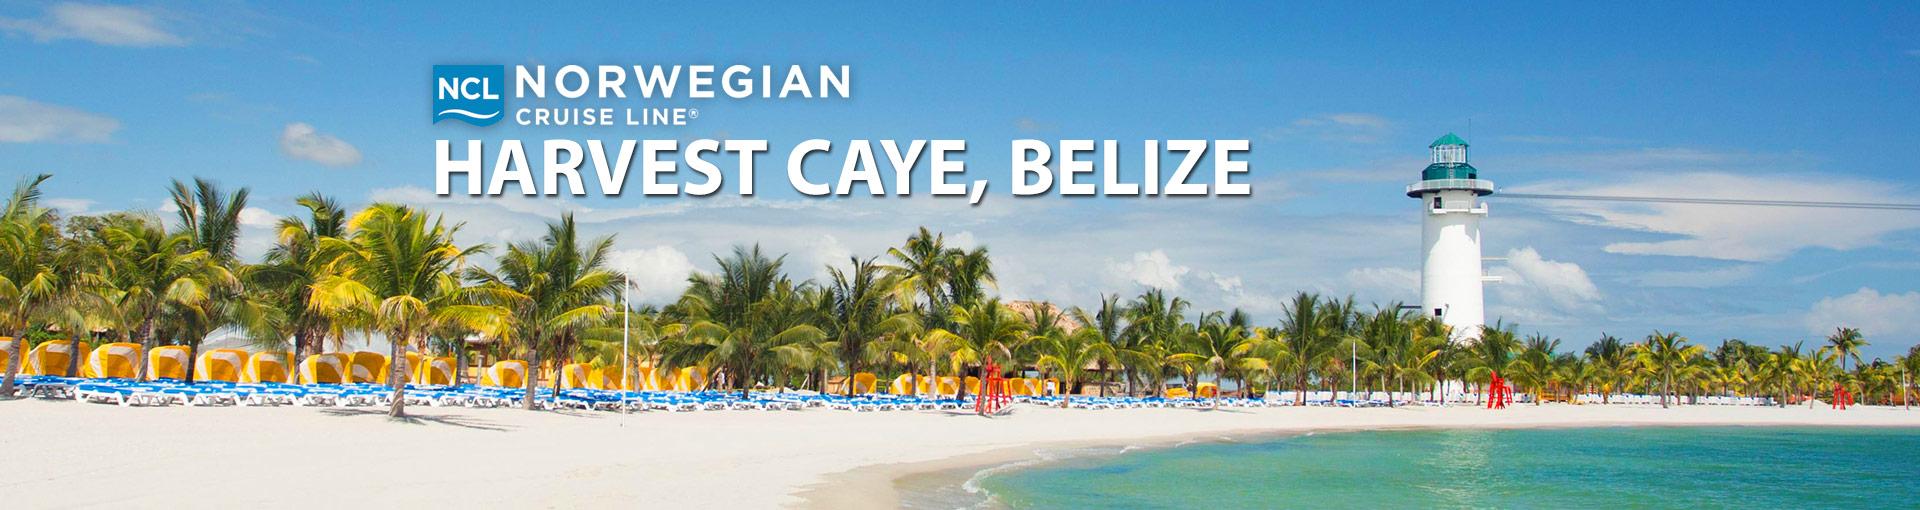 Norwegian Cruise Line's Harvest Caye